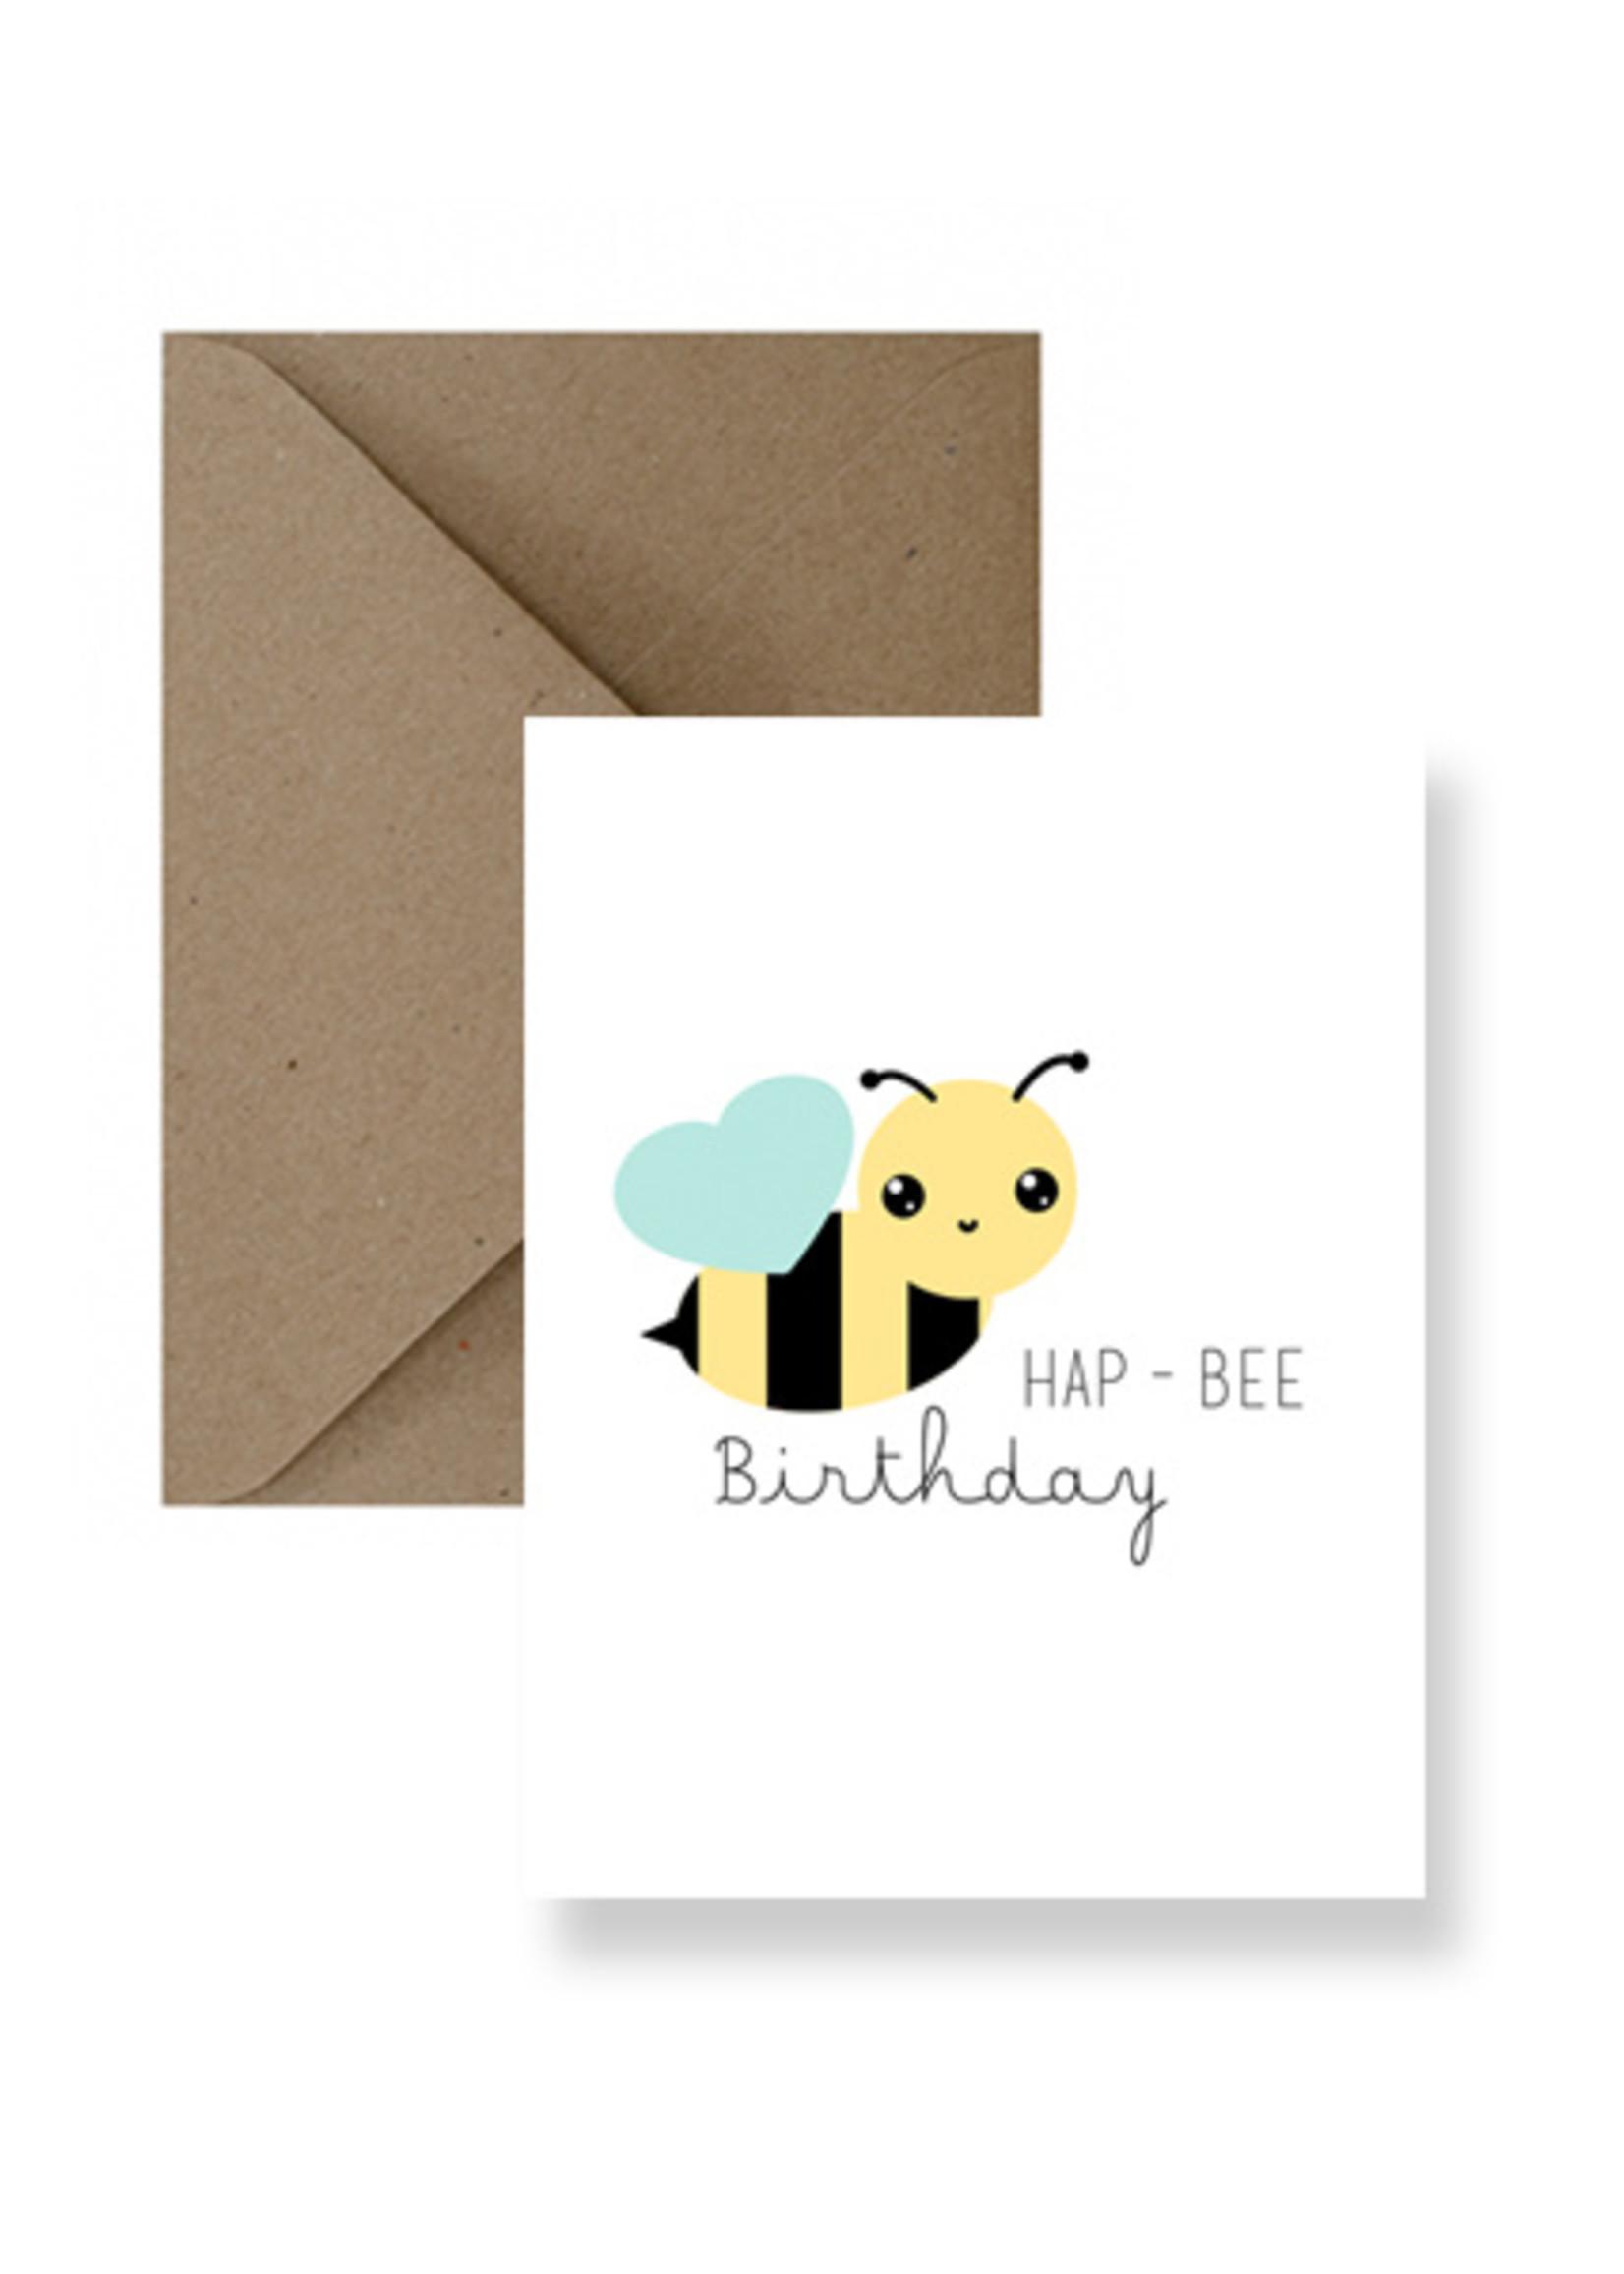 IMPAPER Hap-Bee Birthday Card